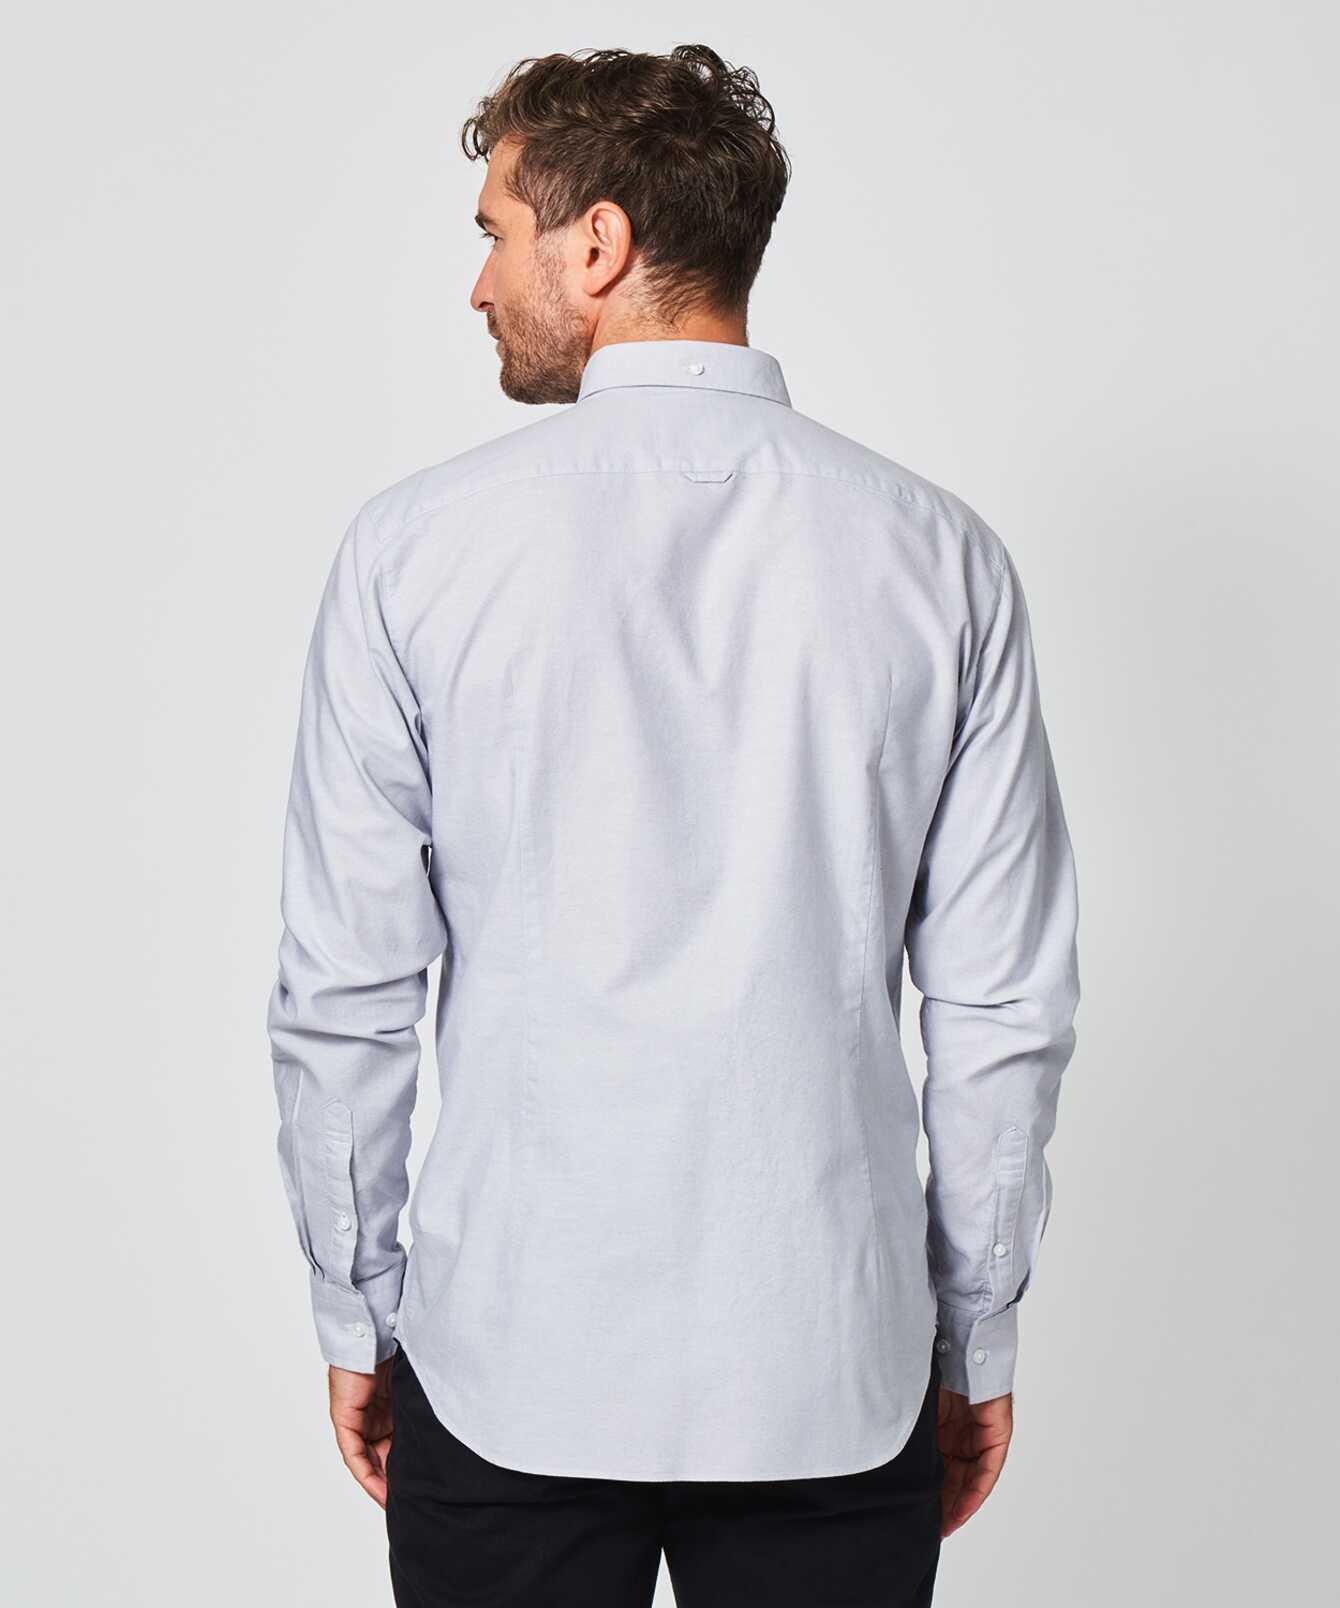 Shirt Hampton Oxford Gray The Shirt Factory